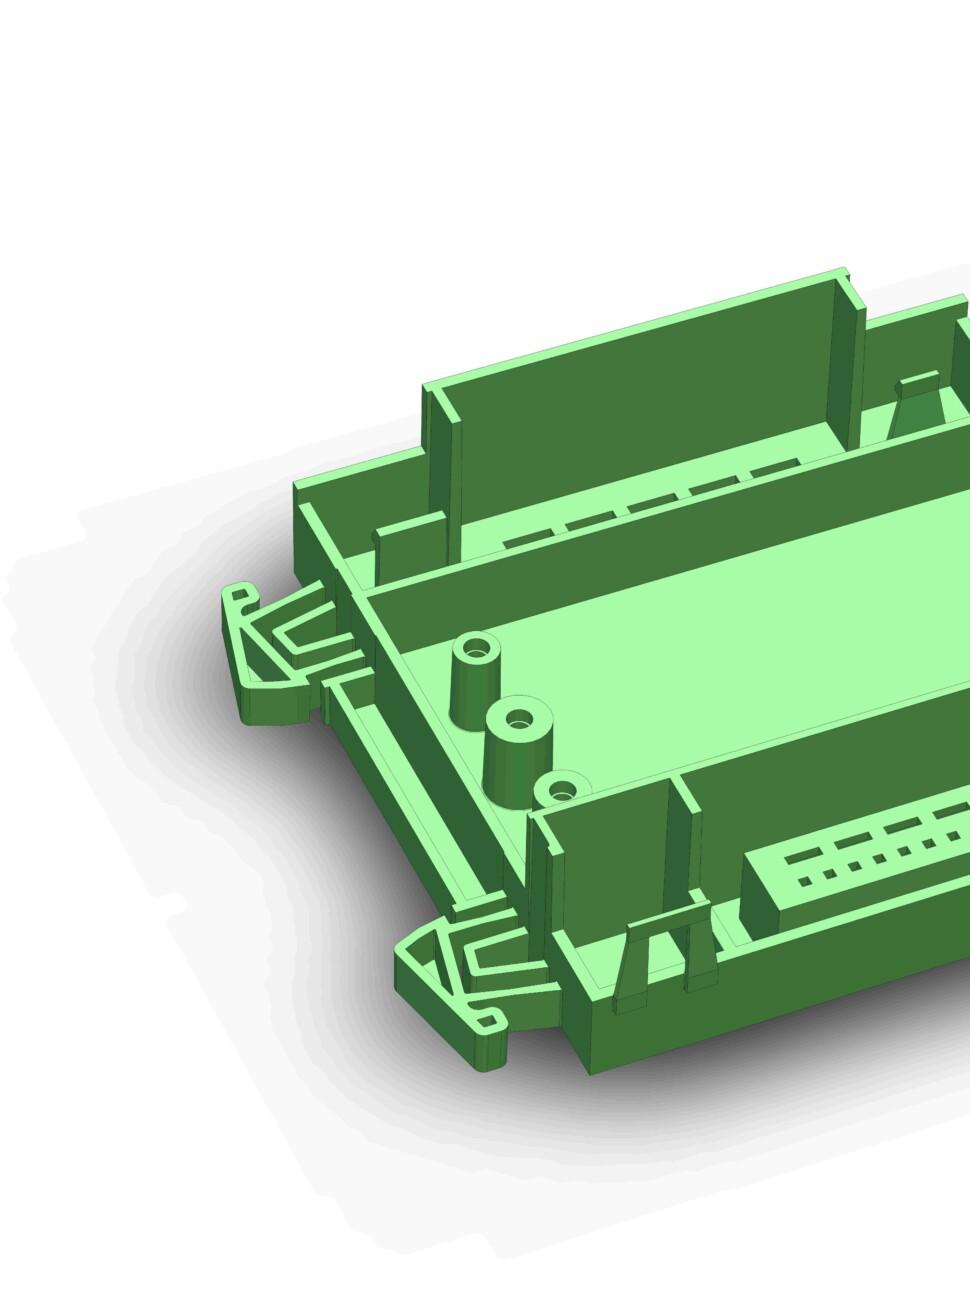 電気・電子産業向け部品用の試作用射出成形金型を開発